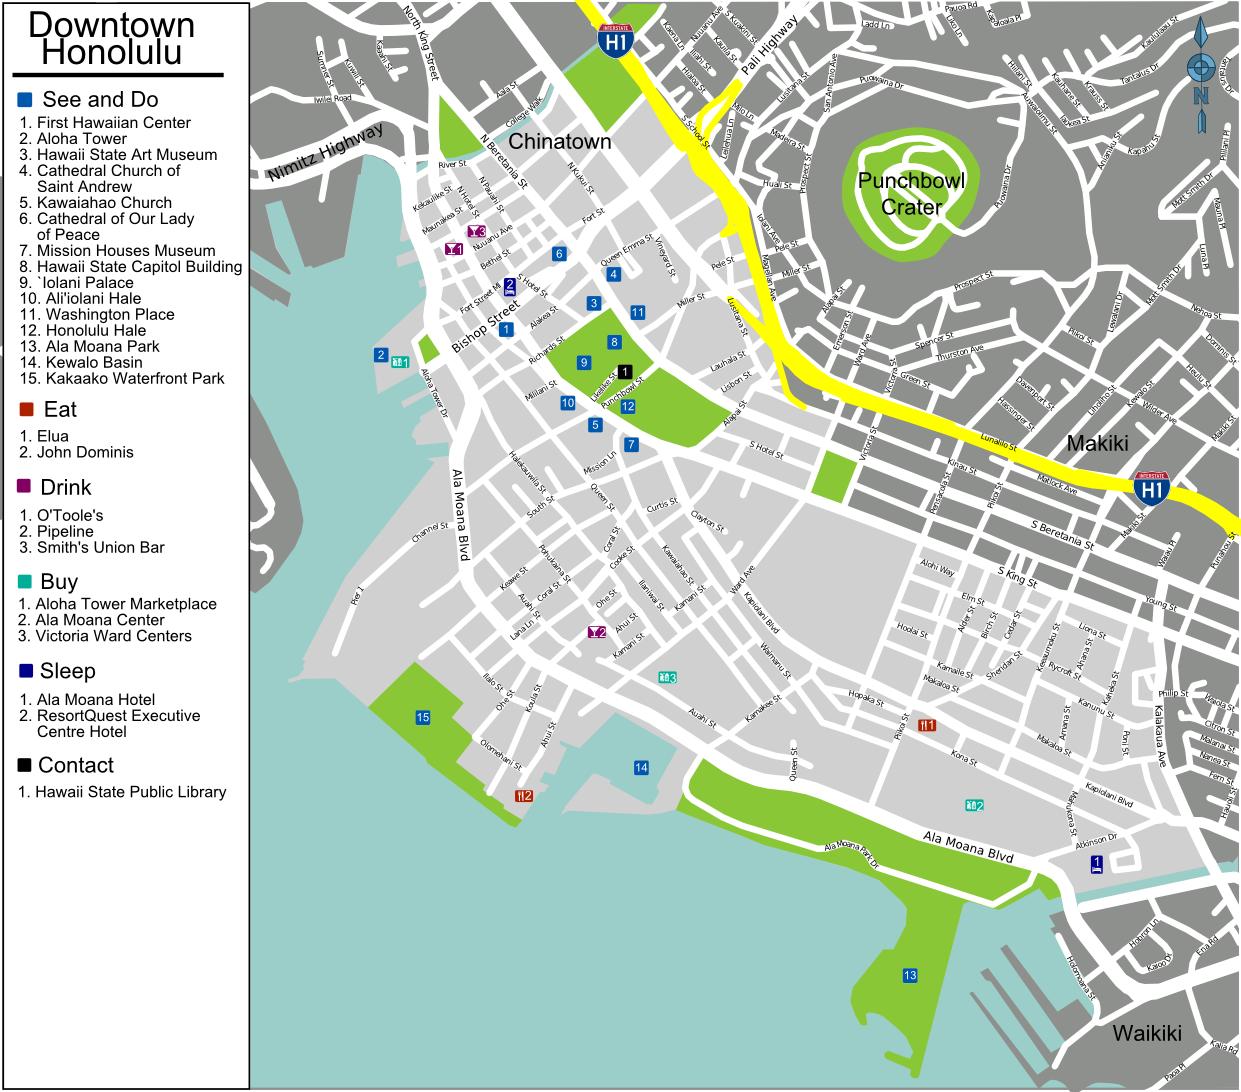 File:Honolulu downtown map.png - Wikimedia Commons